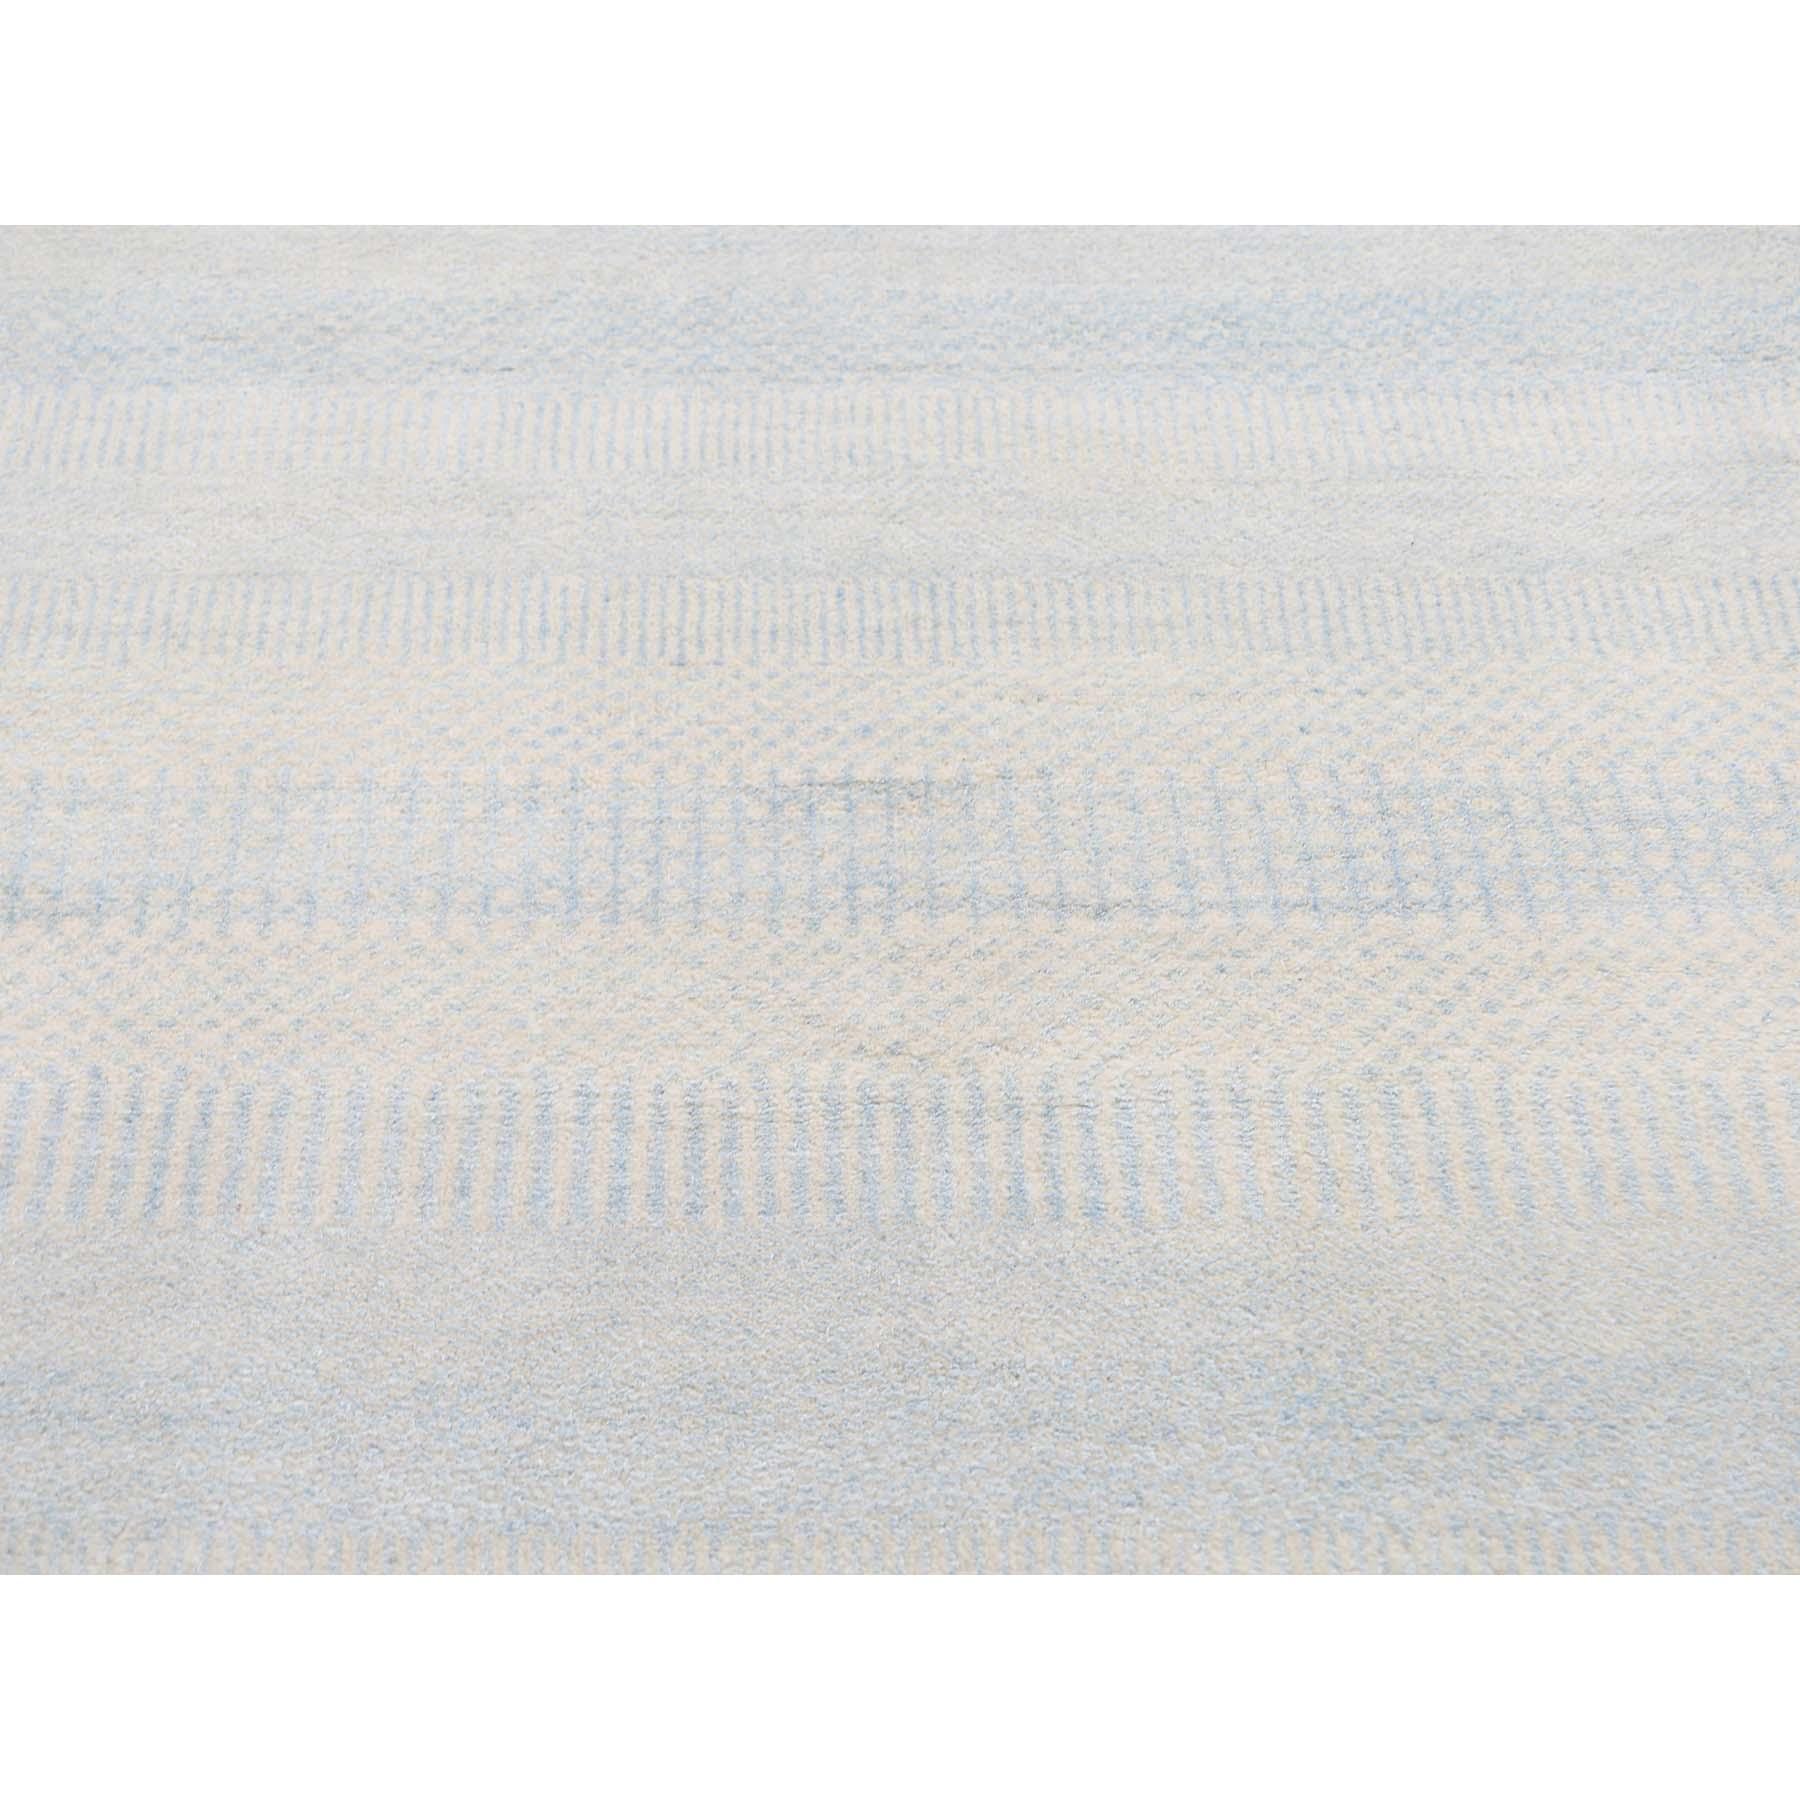 11-8 x11-8  Hand-Knotted Round Wool and Silk Grass Design Oriental Rug